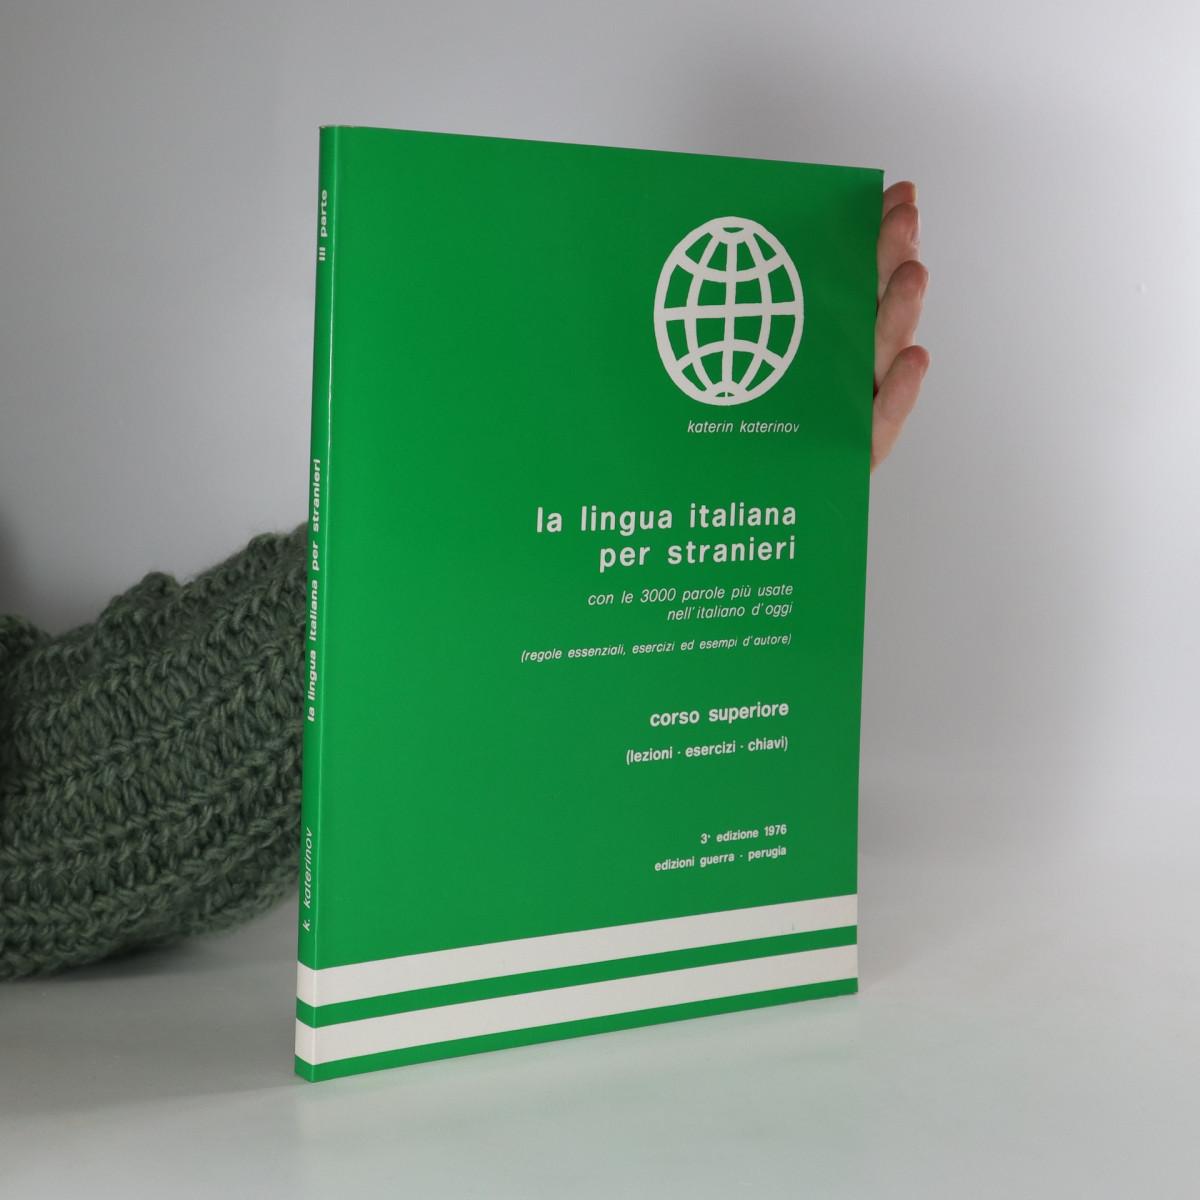 antikvární kniha La lingua italiana per stranieri , 2000